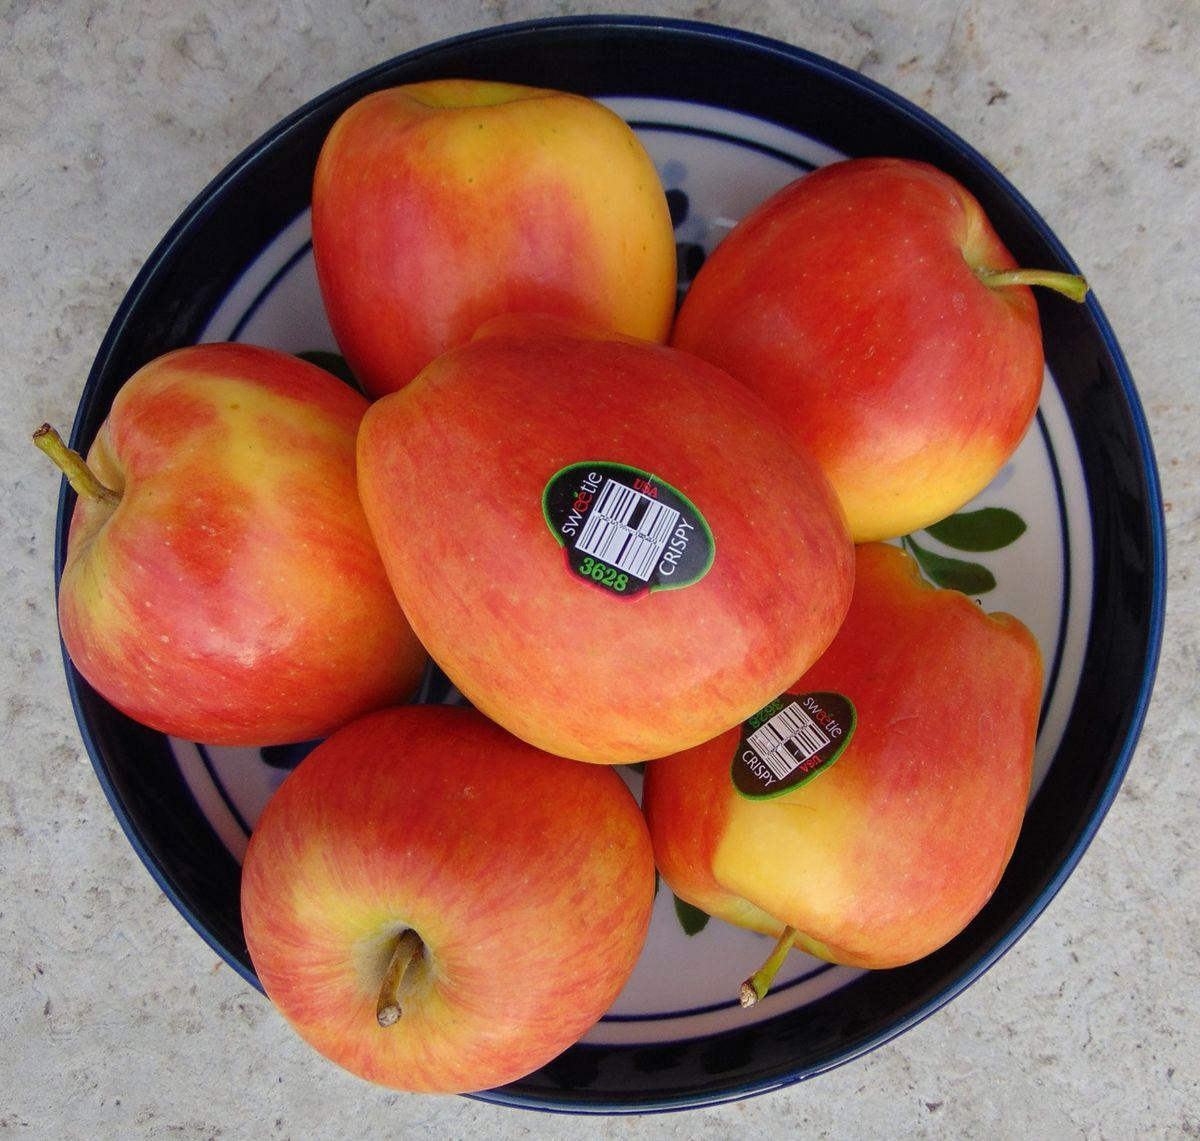 Sweetie (apple)